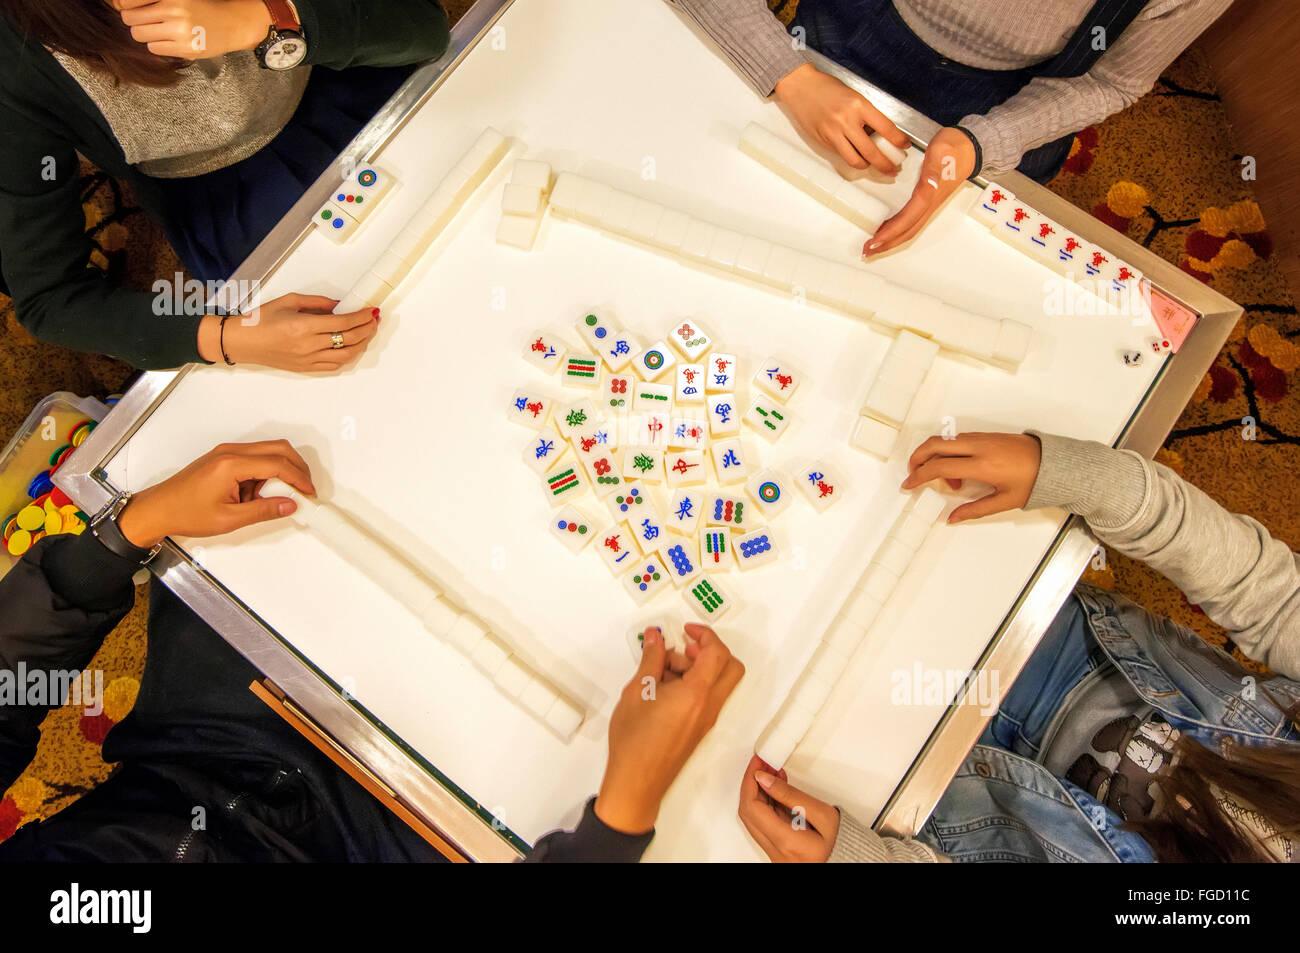 Playing Mahjong Stock Photos & Playing Mahjong Stock Images